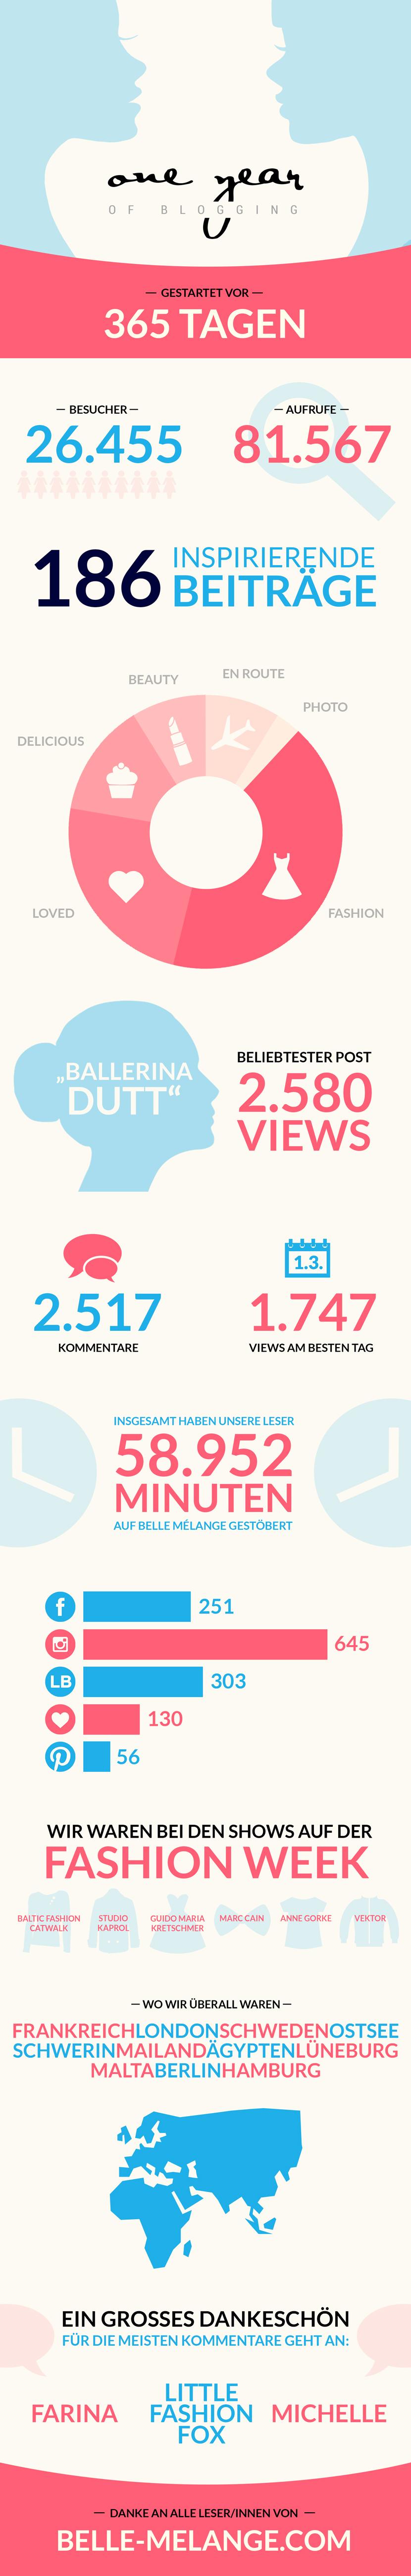 BelleMelange_Birthday_OneYear_Blog_Statistic_Infographic_01